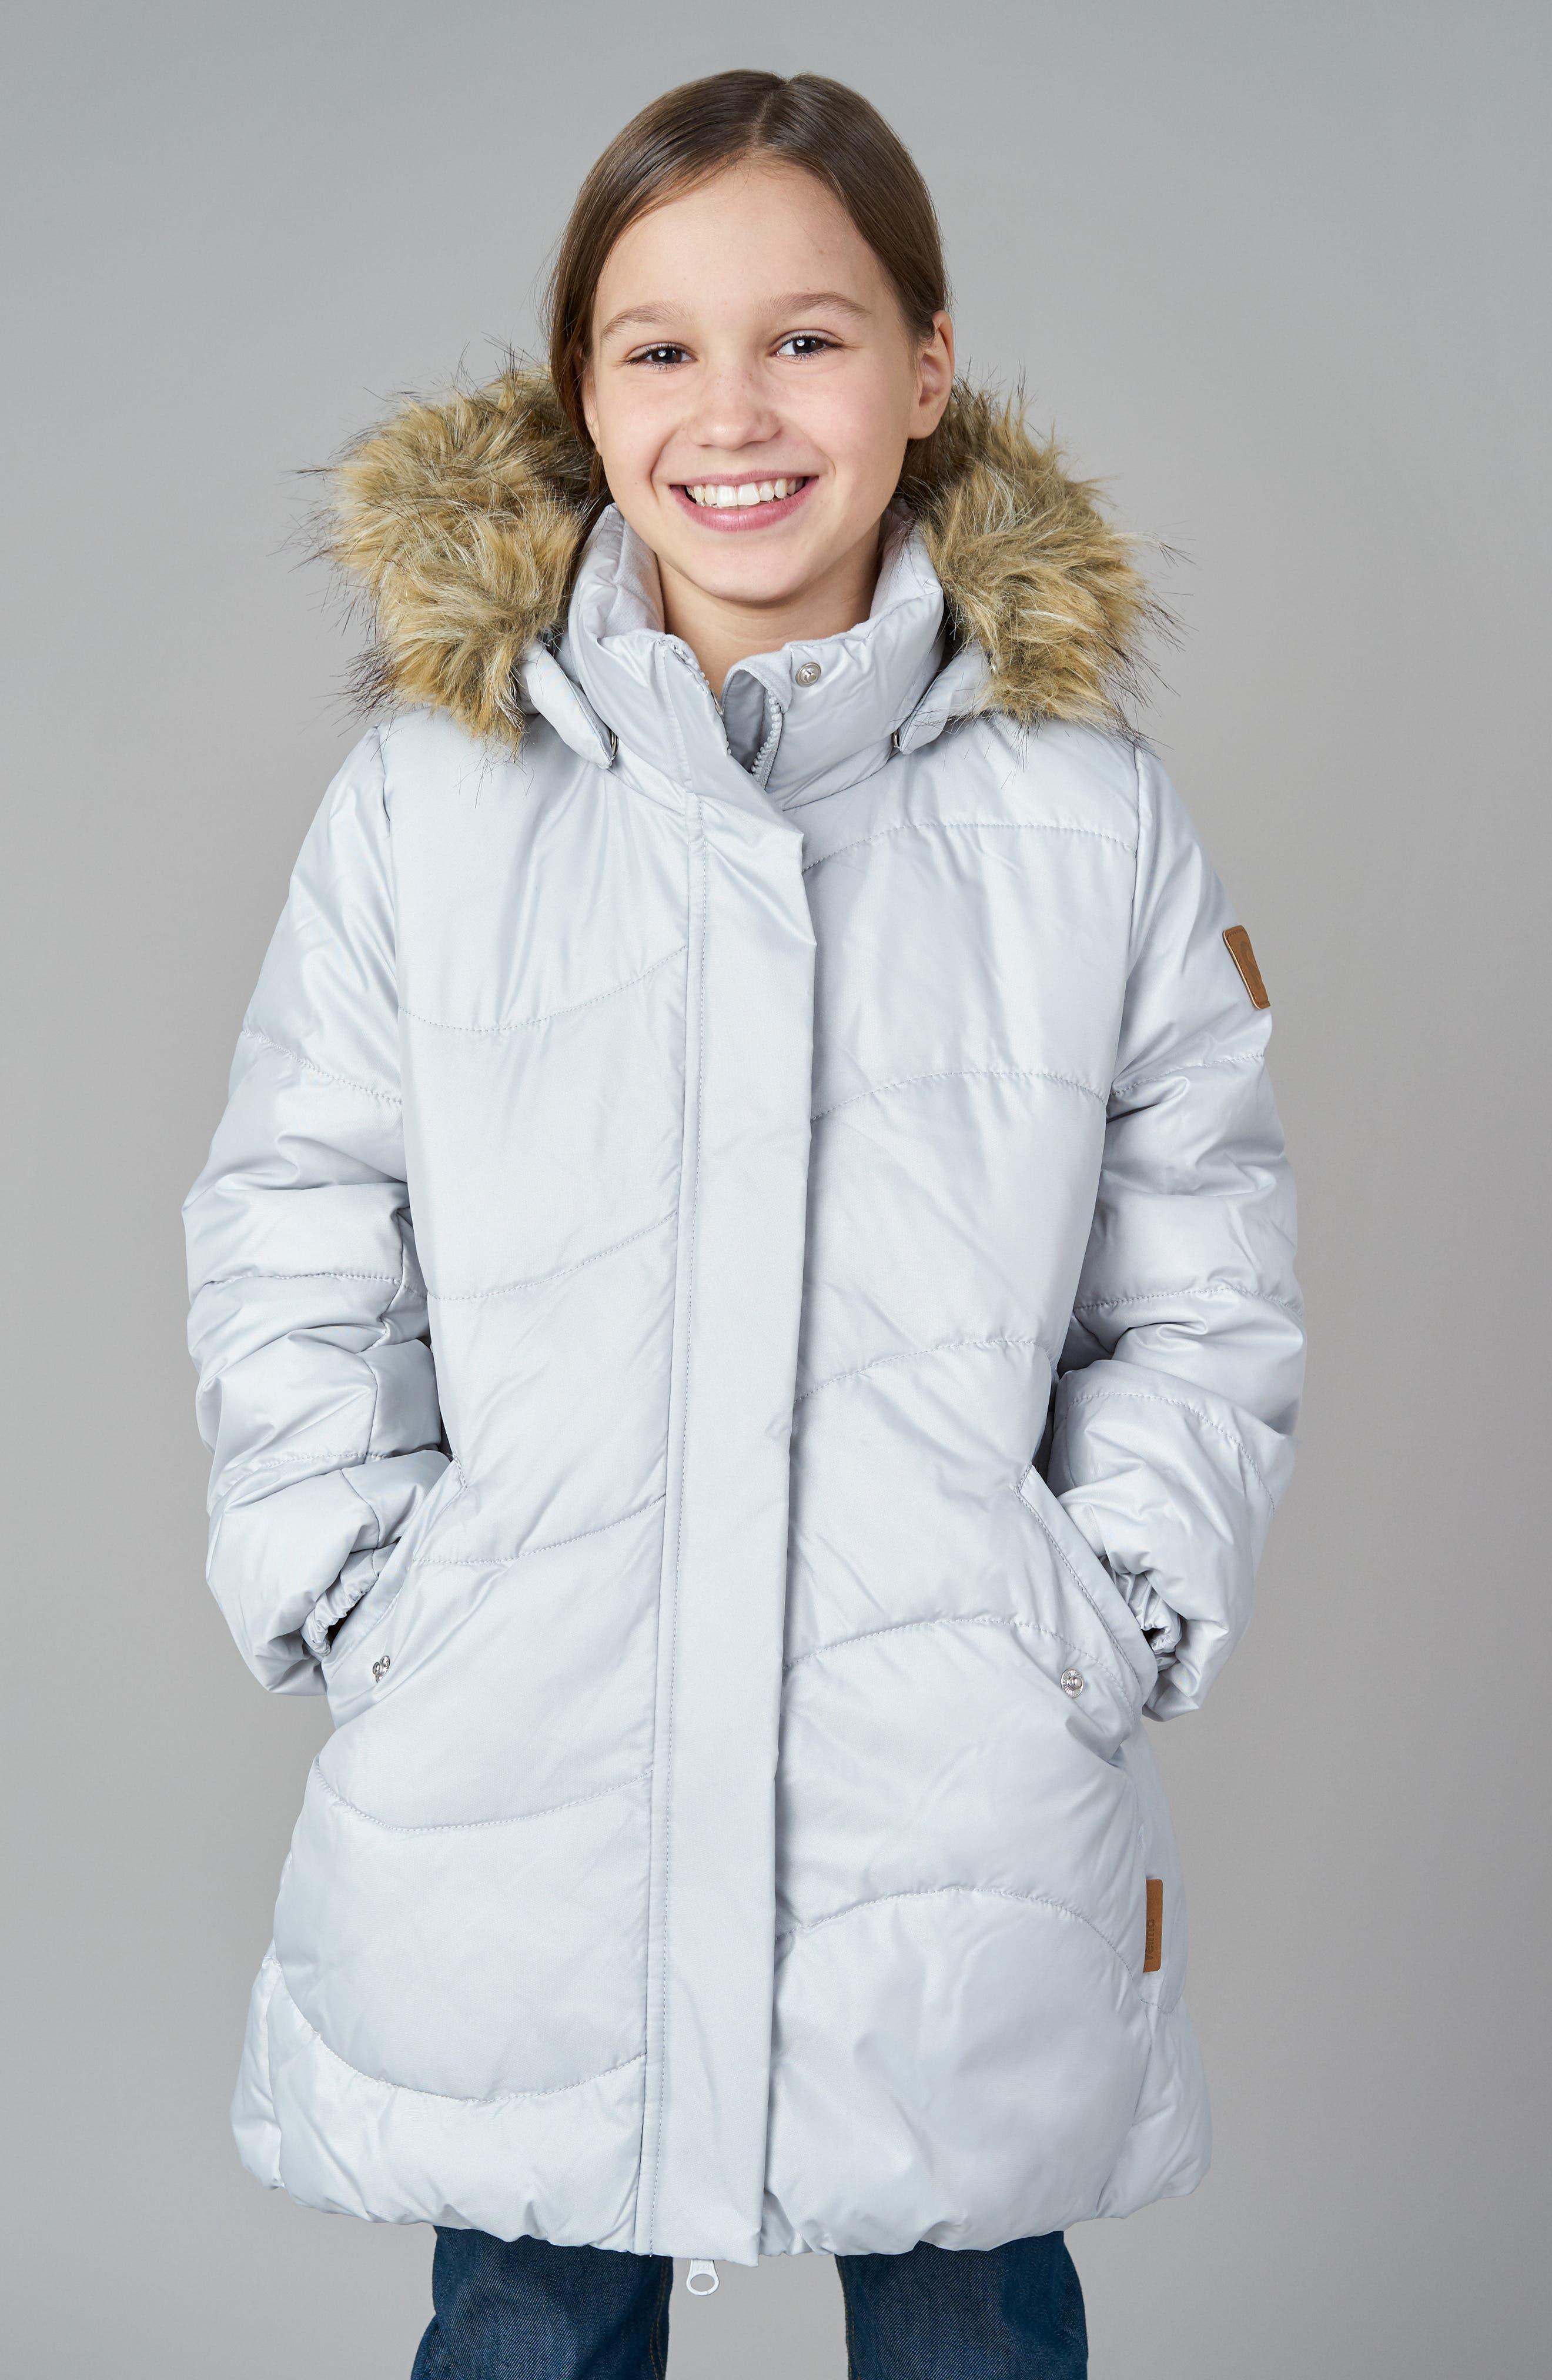 Sula Waterproof Winter Jacket,                             Alternate thumbnail 3, color,                             100